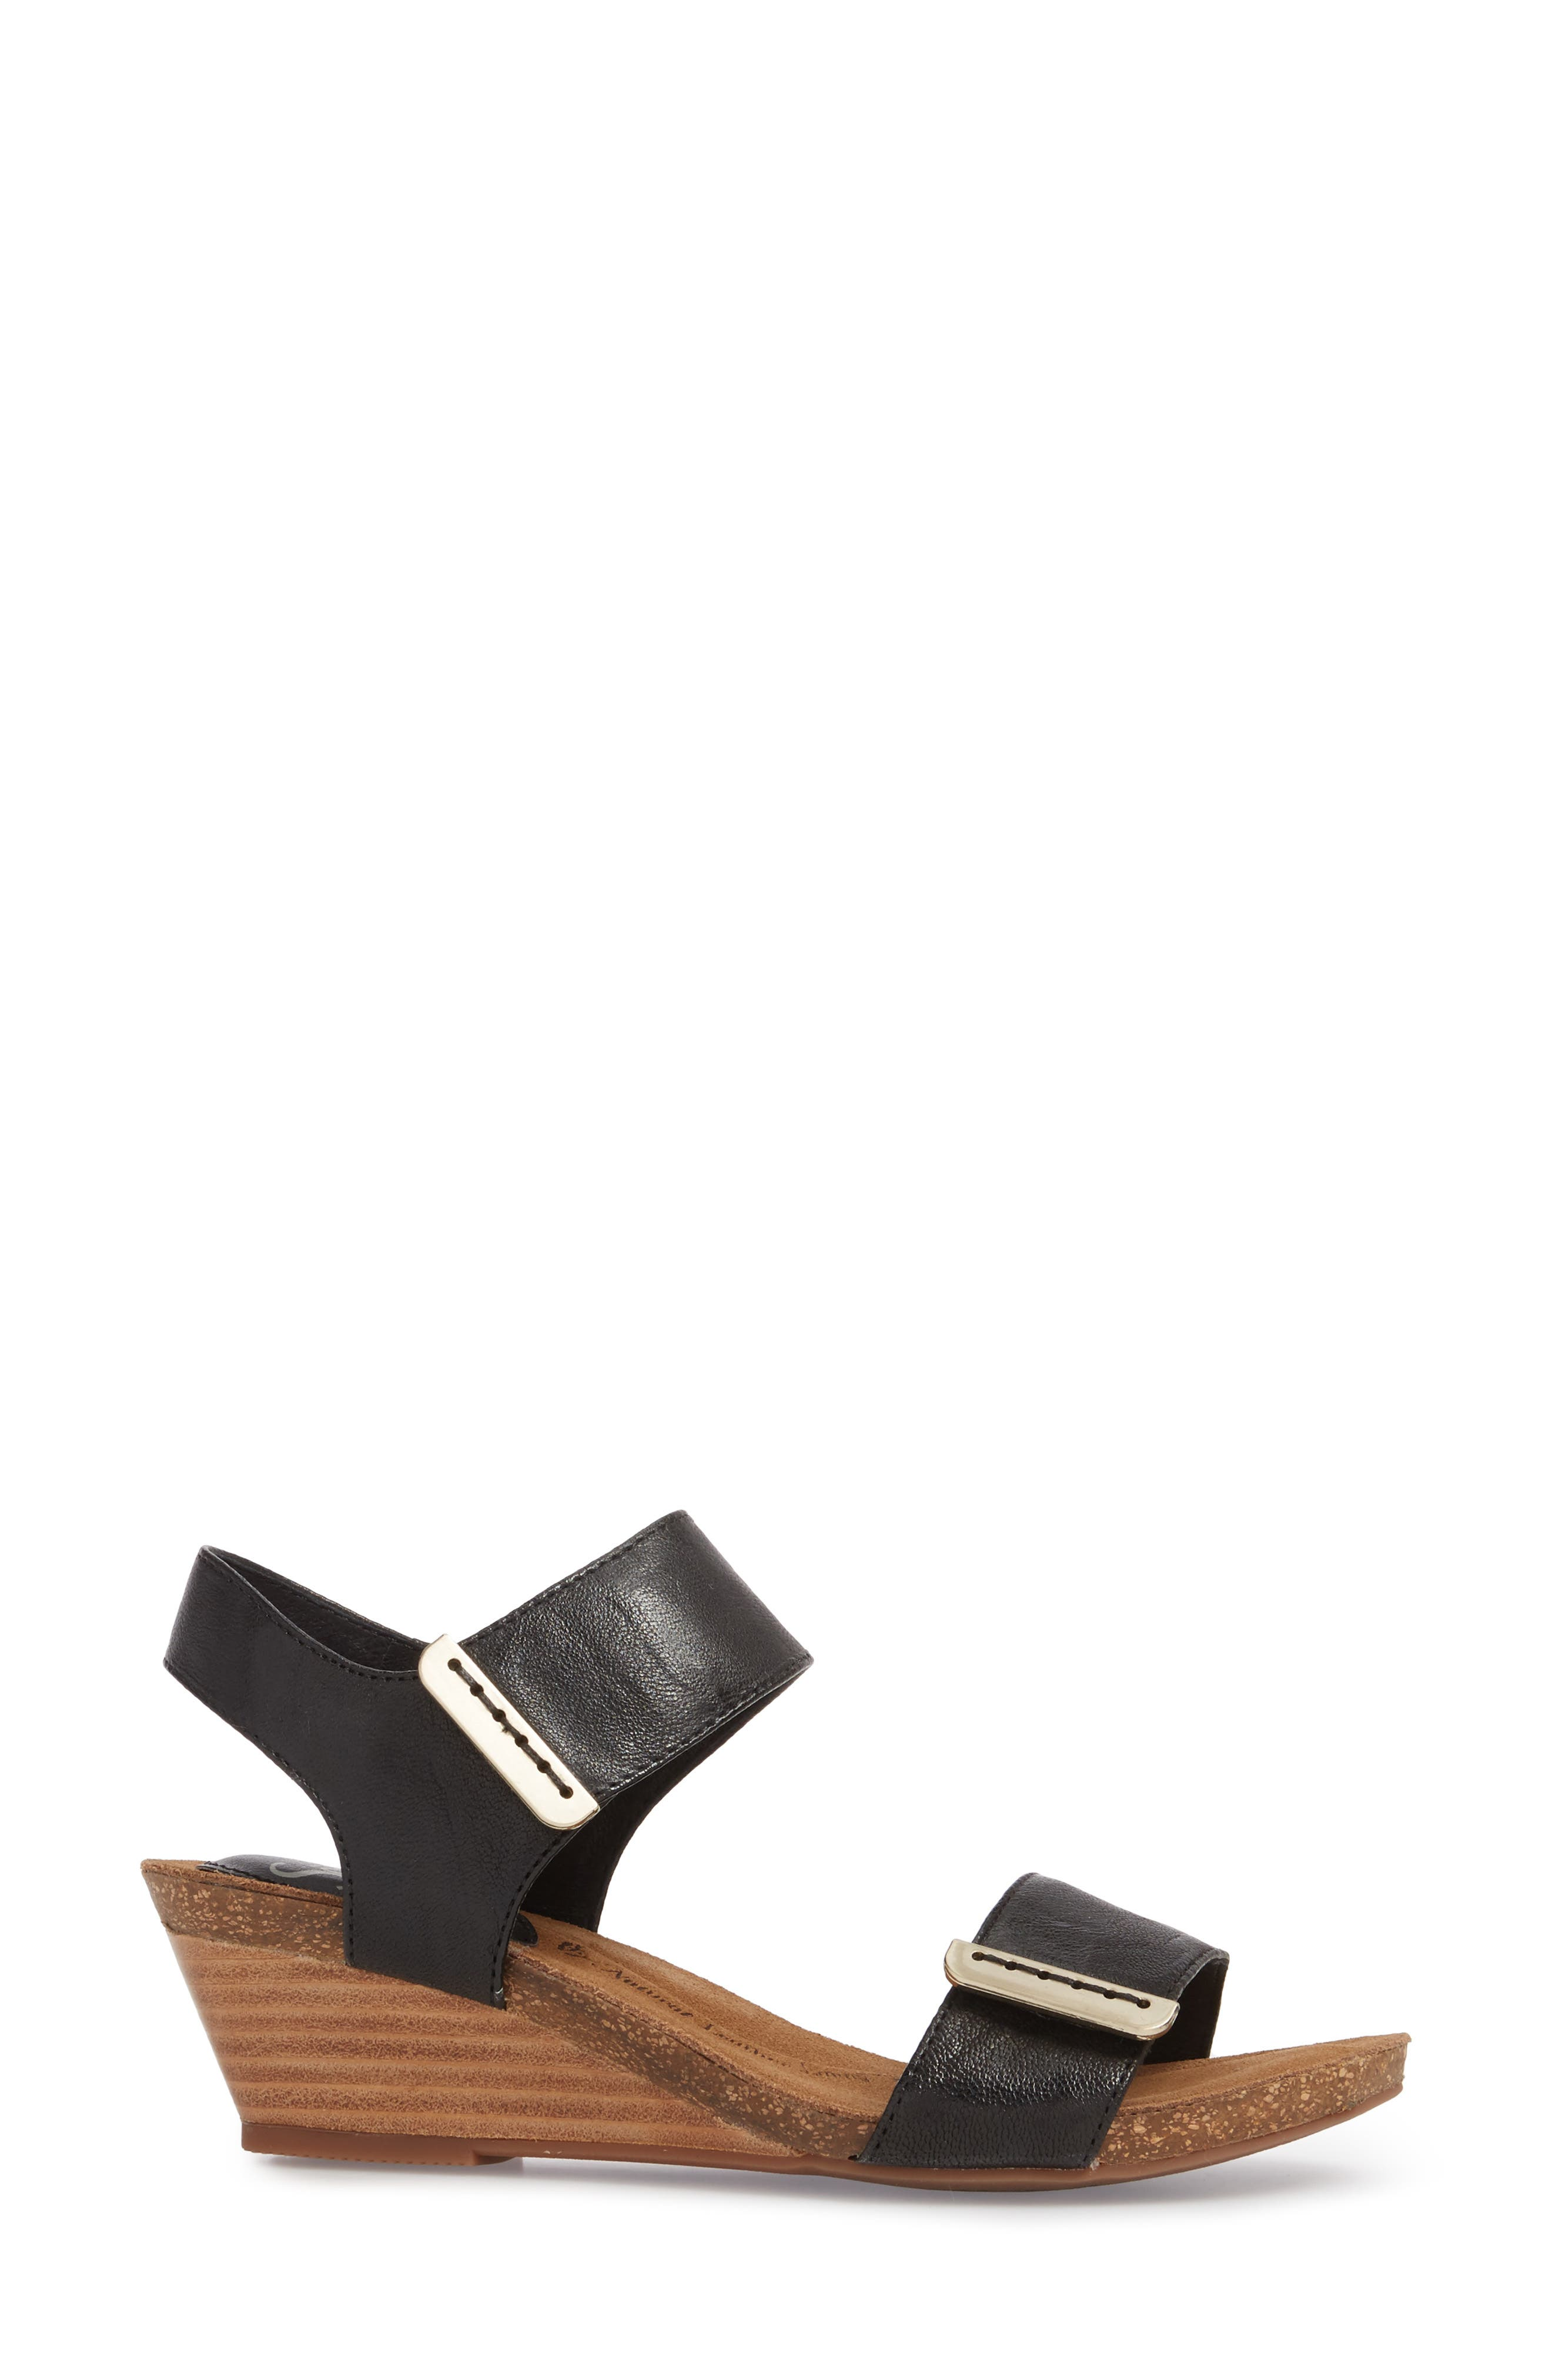 Verdi Wedge Sandal,                             Alternate thumbnail 3, color,                             Black Leather